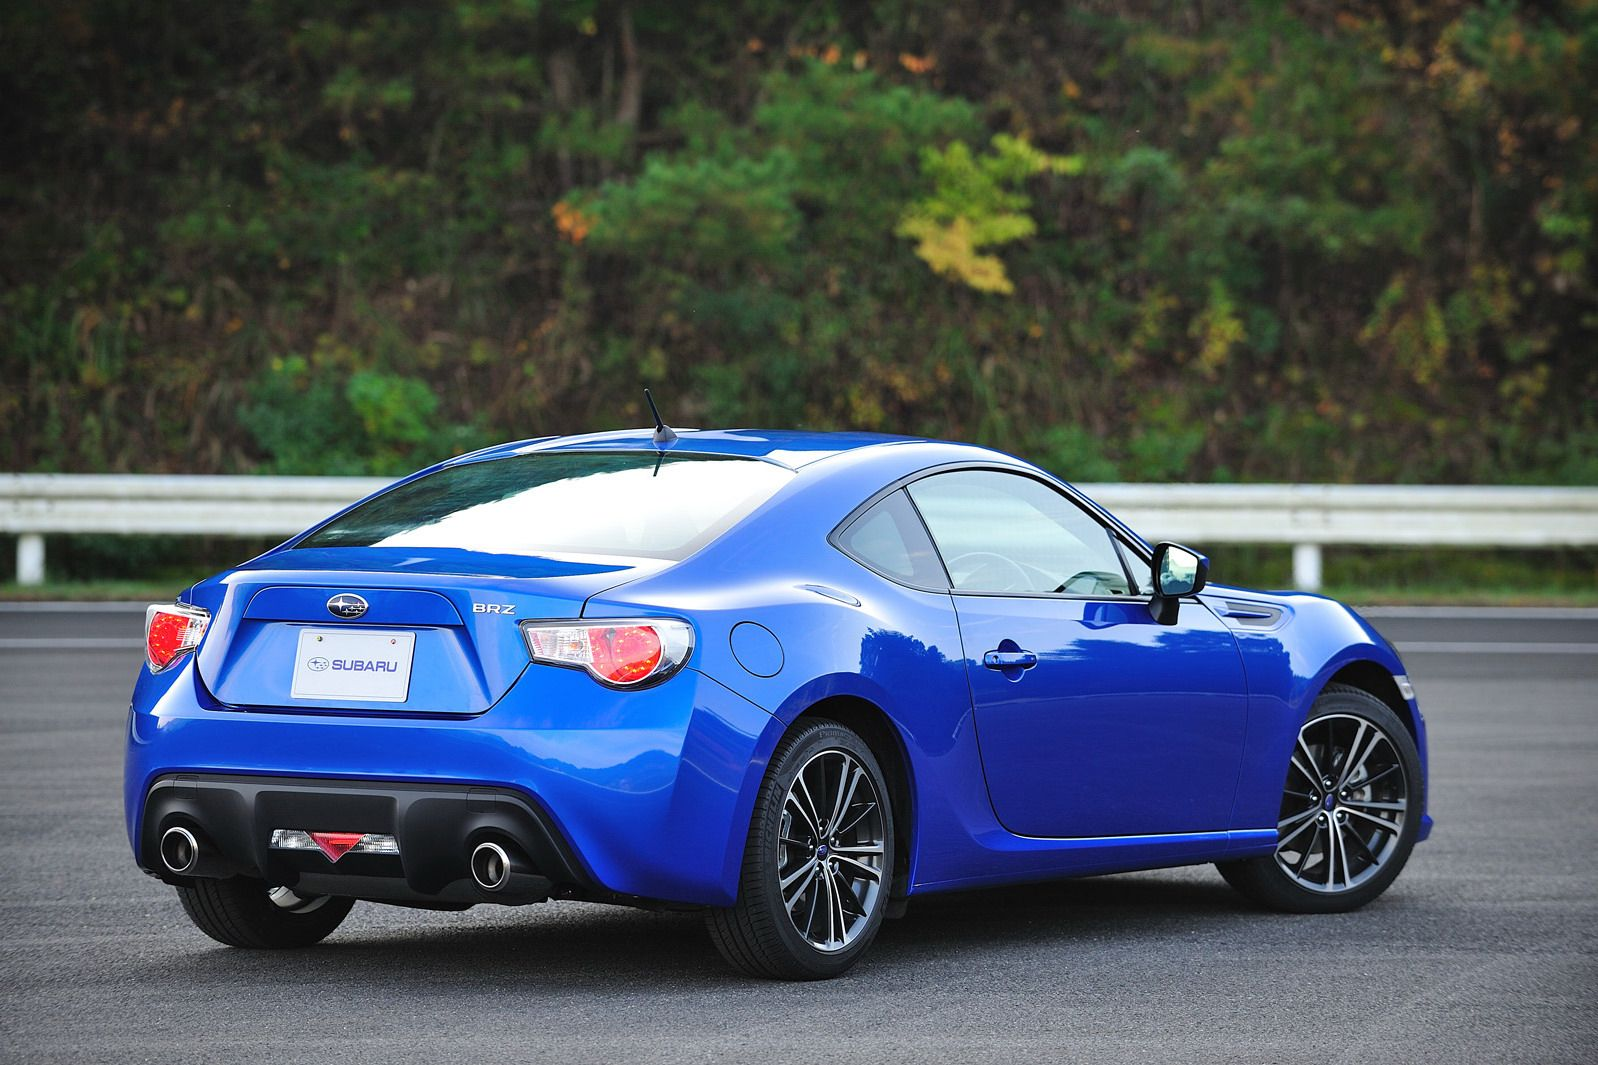 Subaru Brz Interior Revealed Makes Video Debut Subaru Brz Subaru Brz Interior Cool Sports Cars